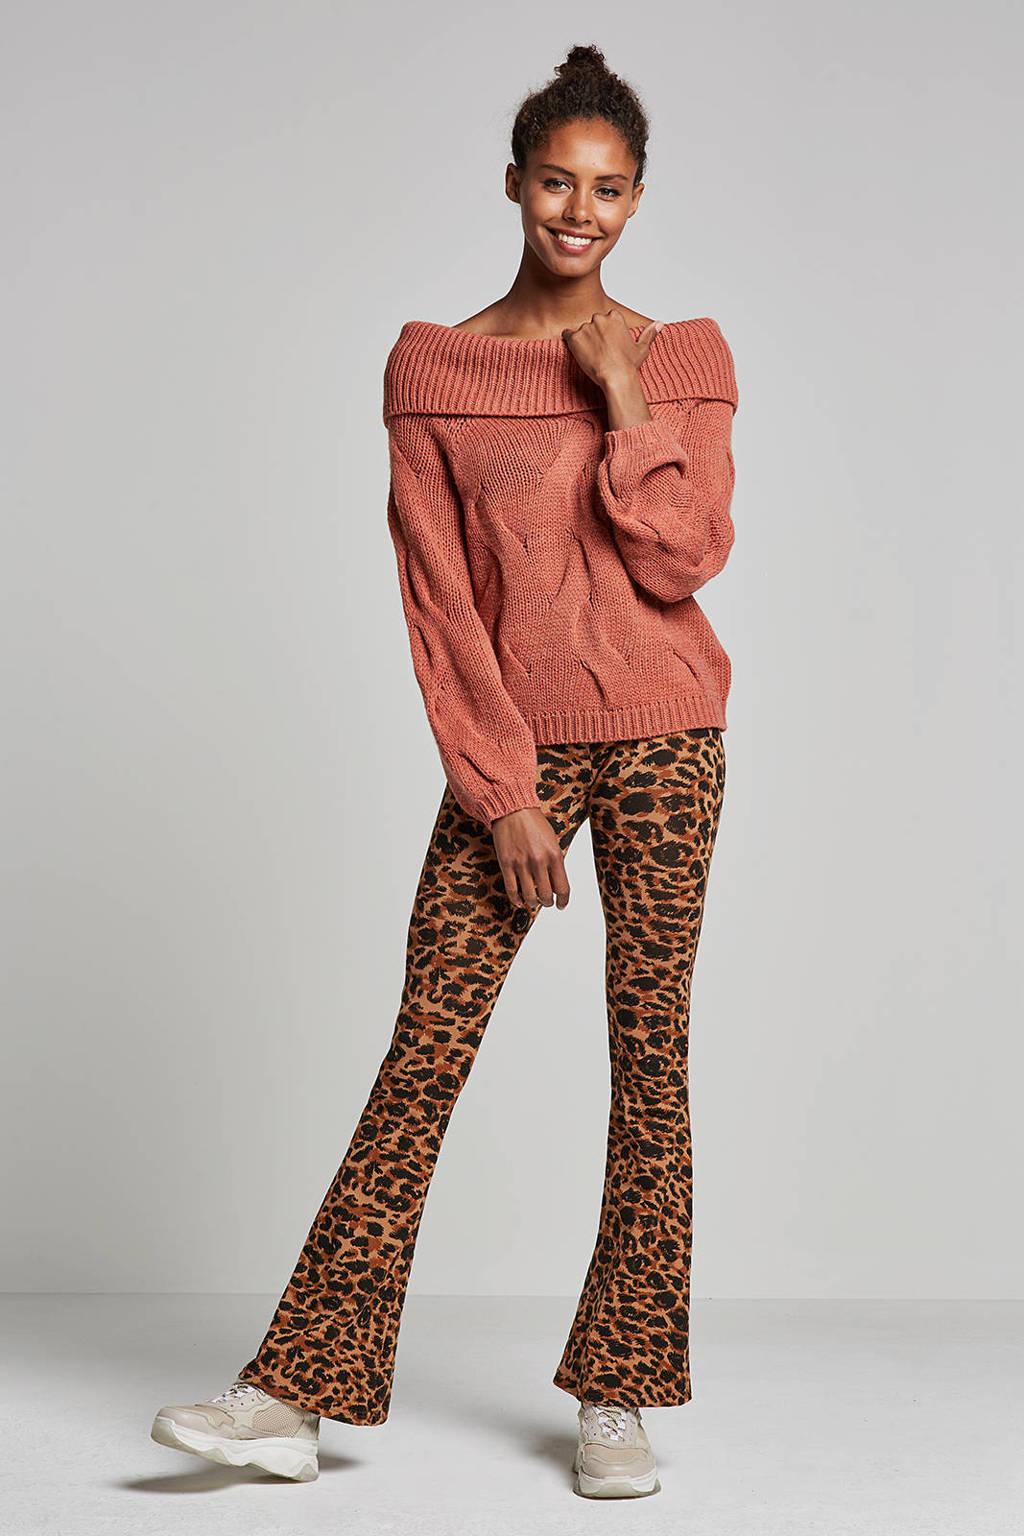 Colourful Rebel Leopard flared legging in een panterprint, Bruin/zwart